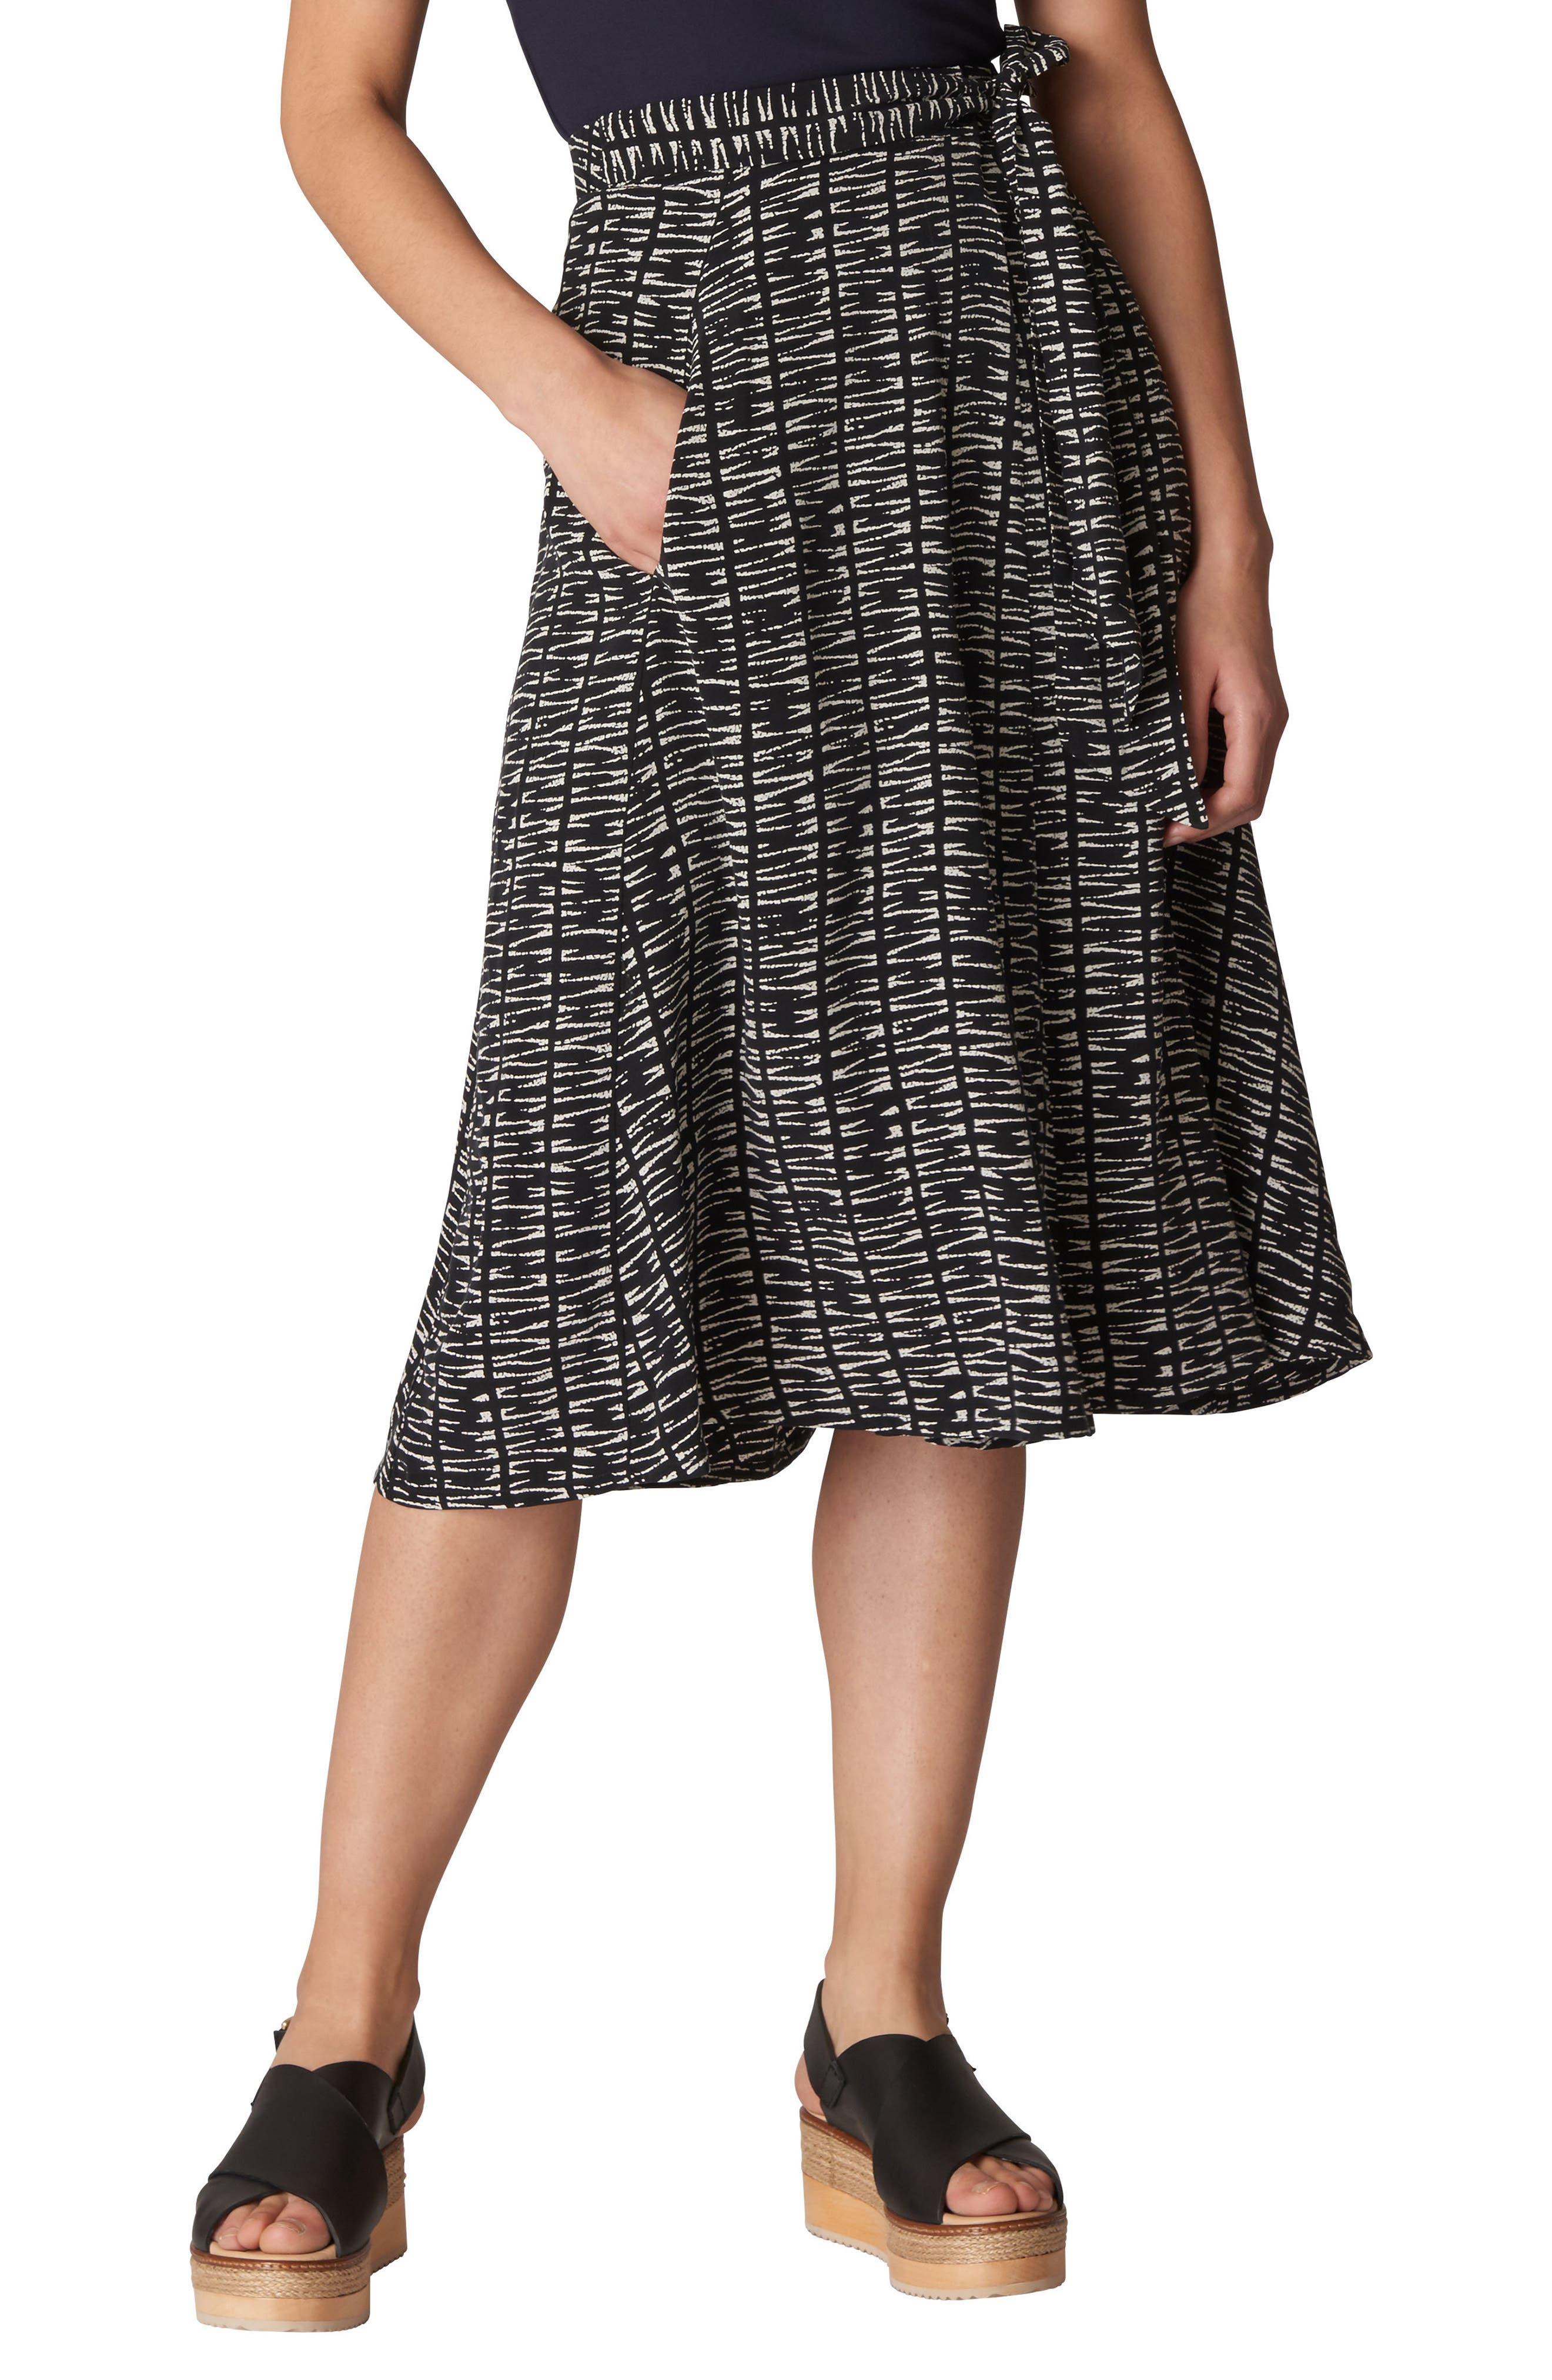 Avie Sahara Print Wrap Skirt,                             Main thumbnail 1, color,                             Black/ Multi